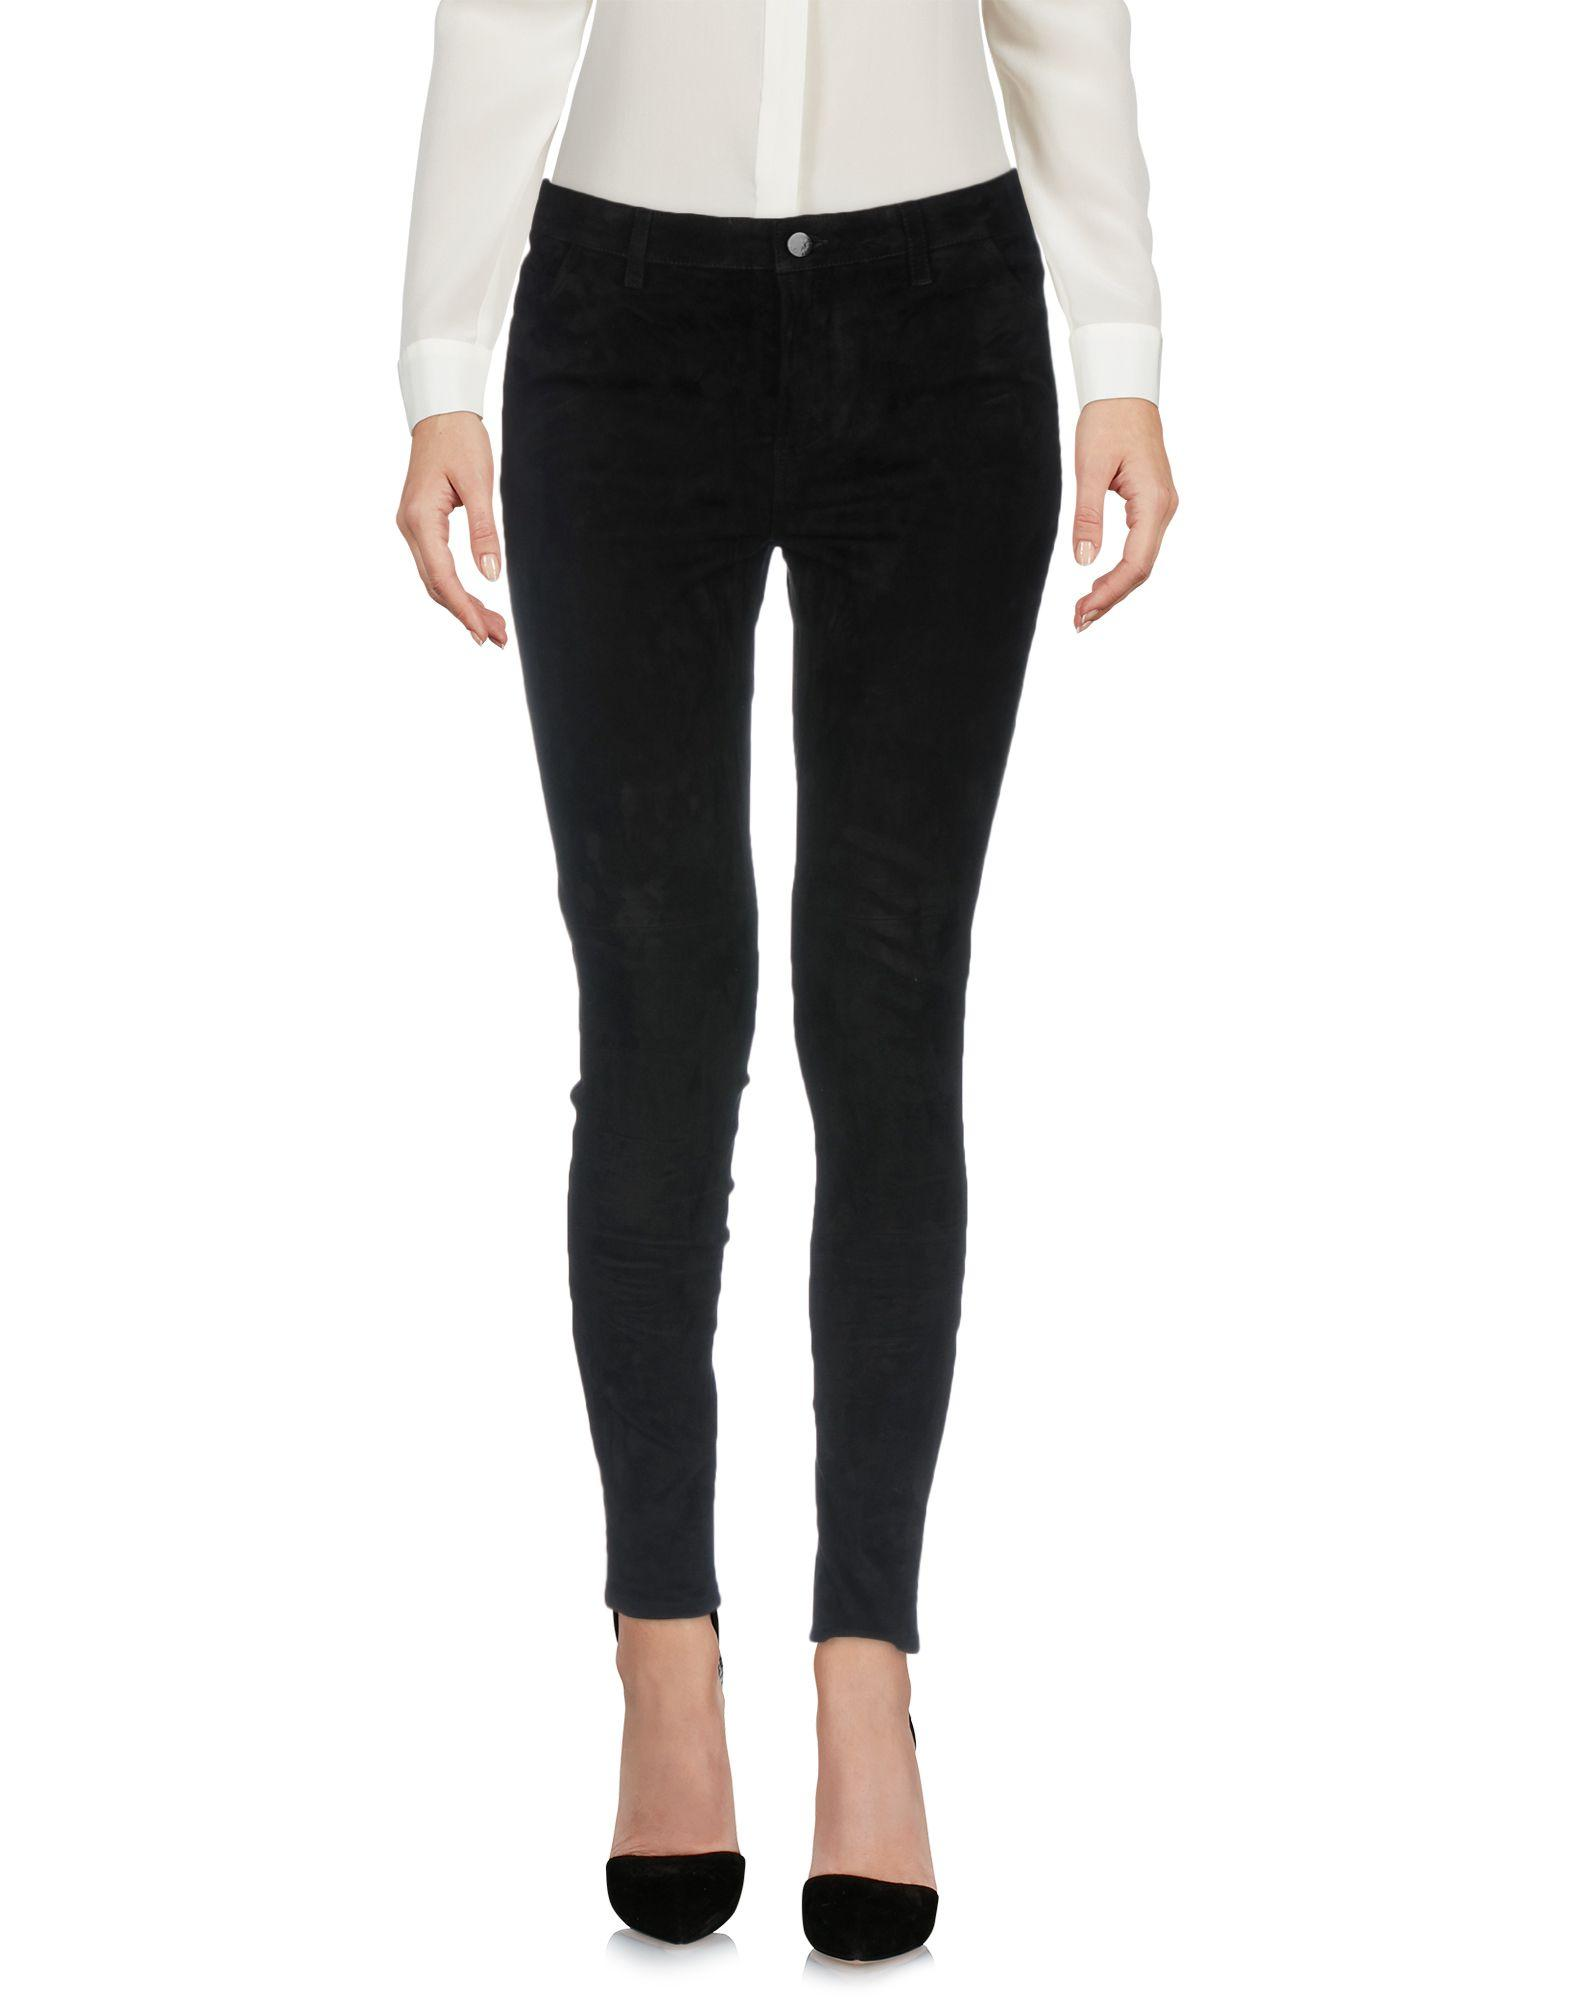 Rebecca Minkoff Casual Pants In Black